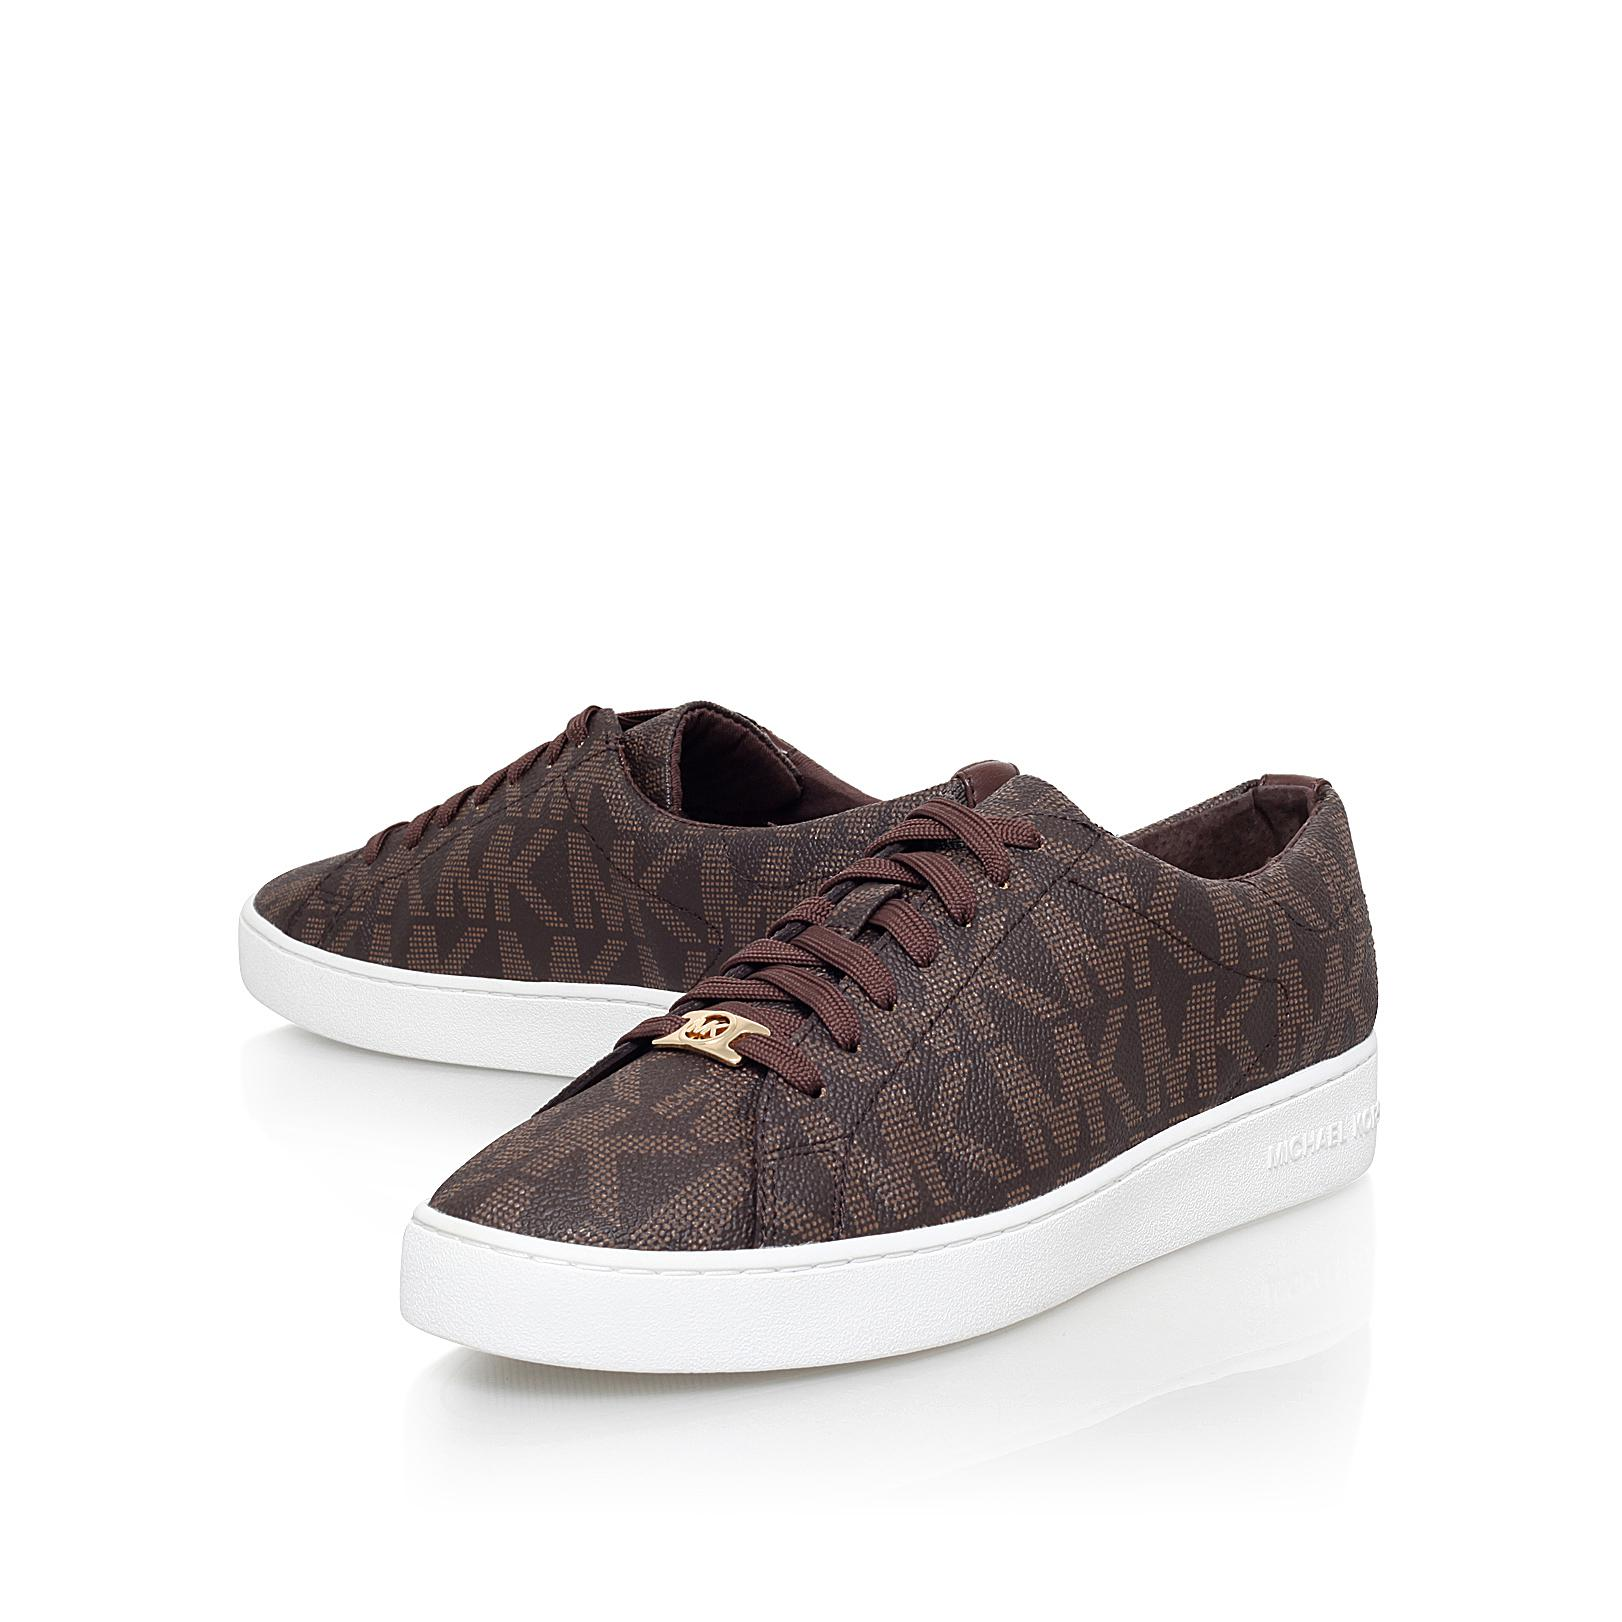 MICHAEL Michael Kors Synthetic Keaton Sneaker in Brown